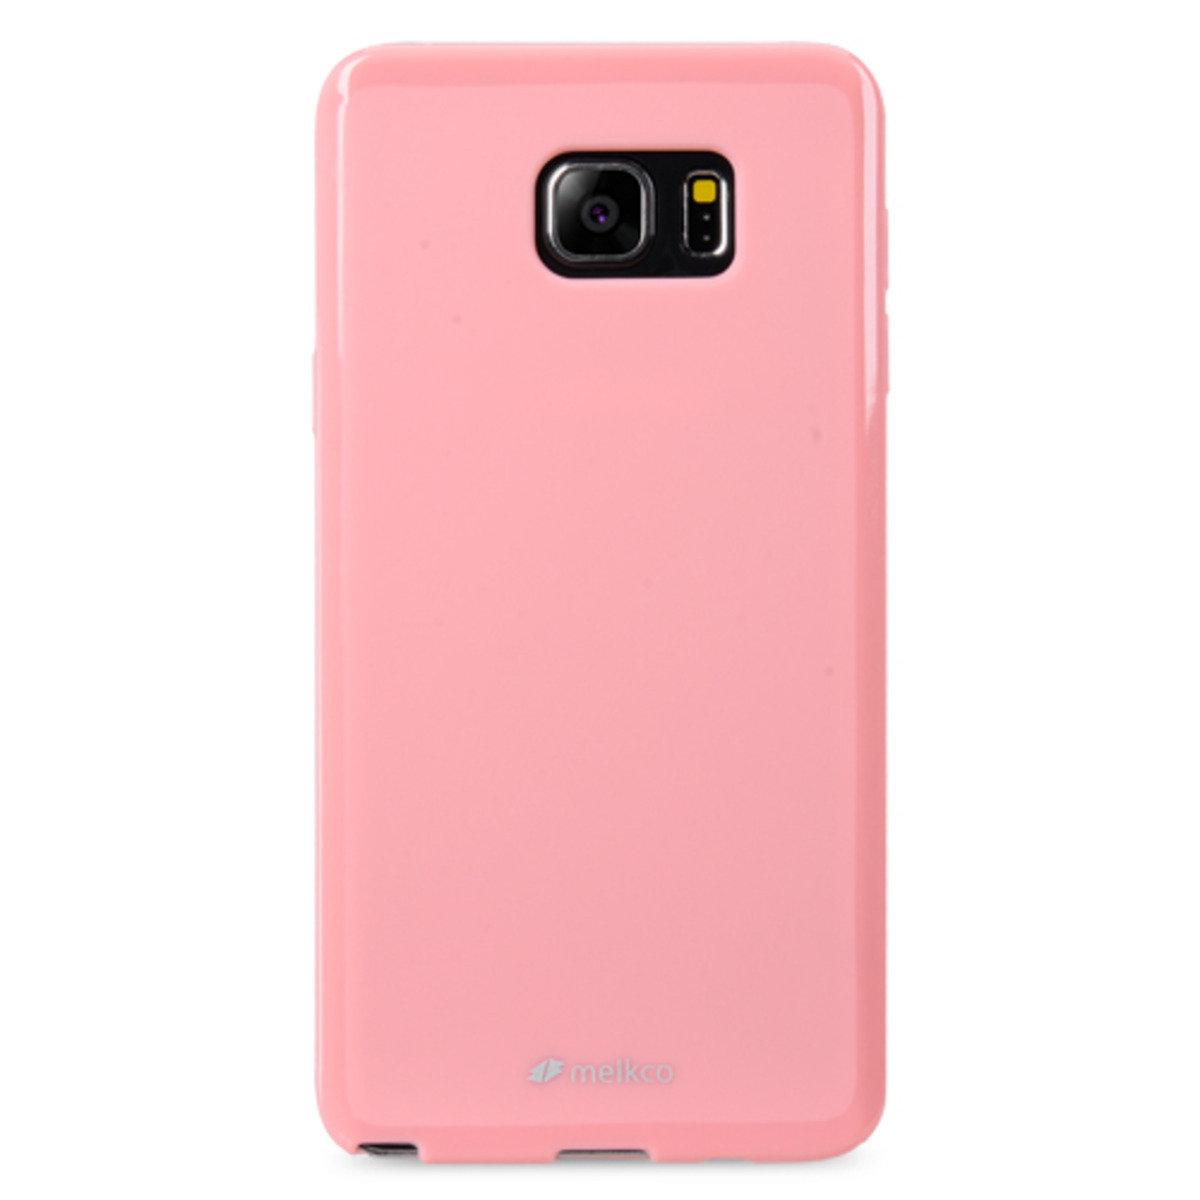 Galaxy Note 5 Poly Jacket手機保護殼 - 珍珠粉紅色(附送屏幕保護貼)